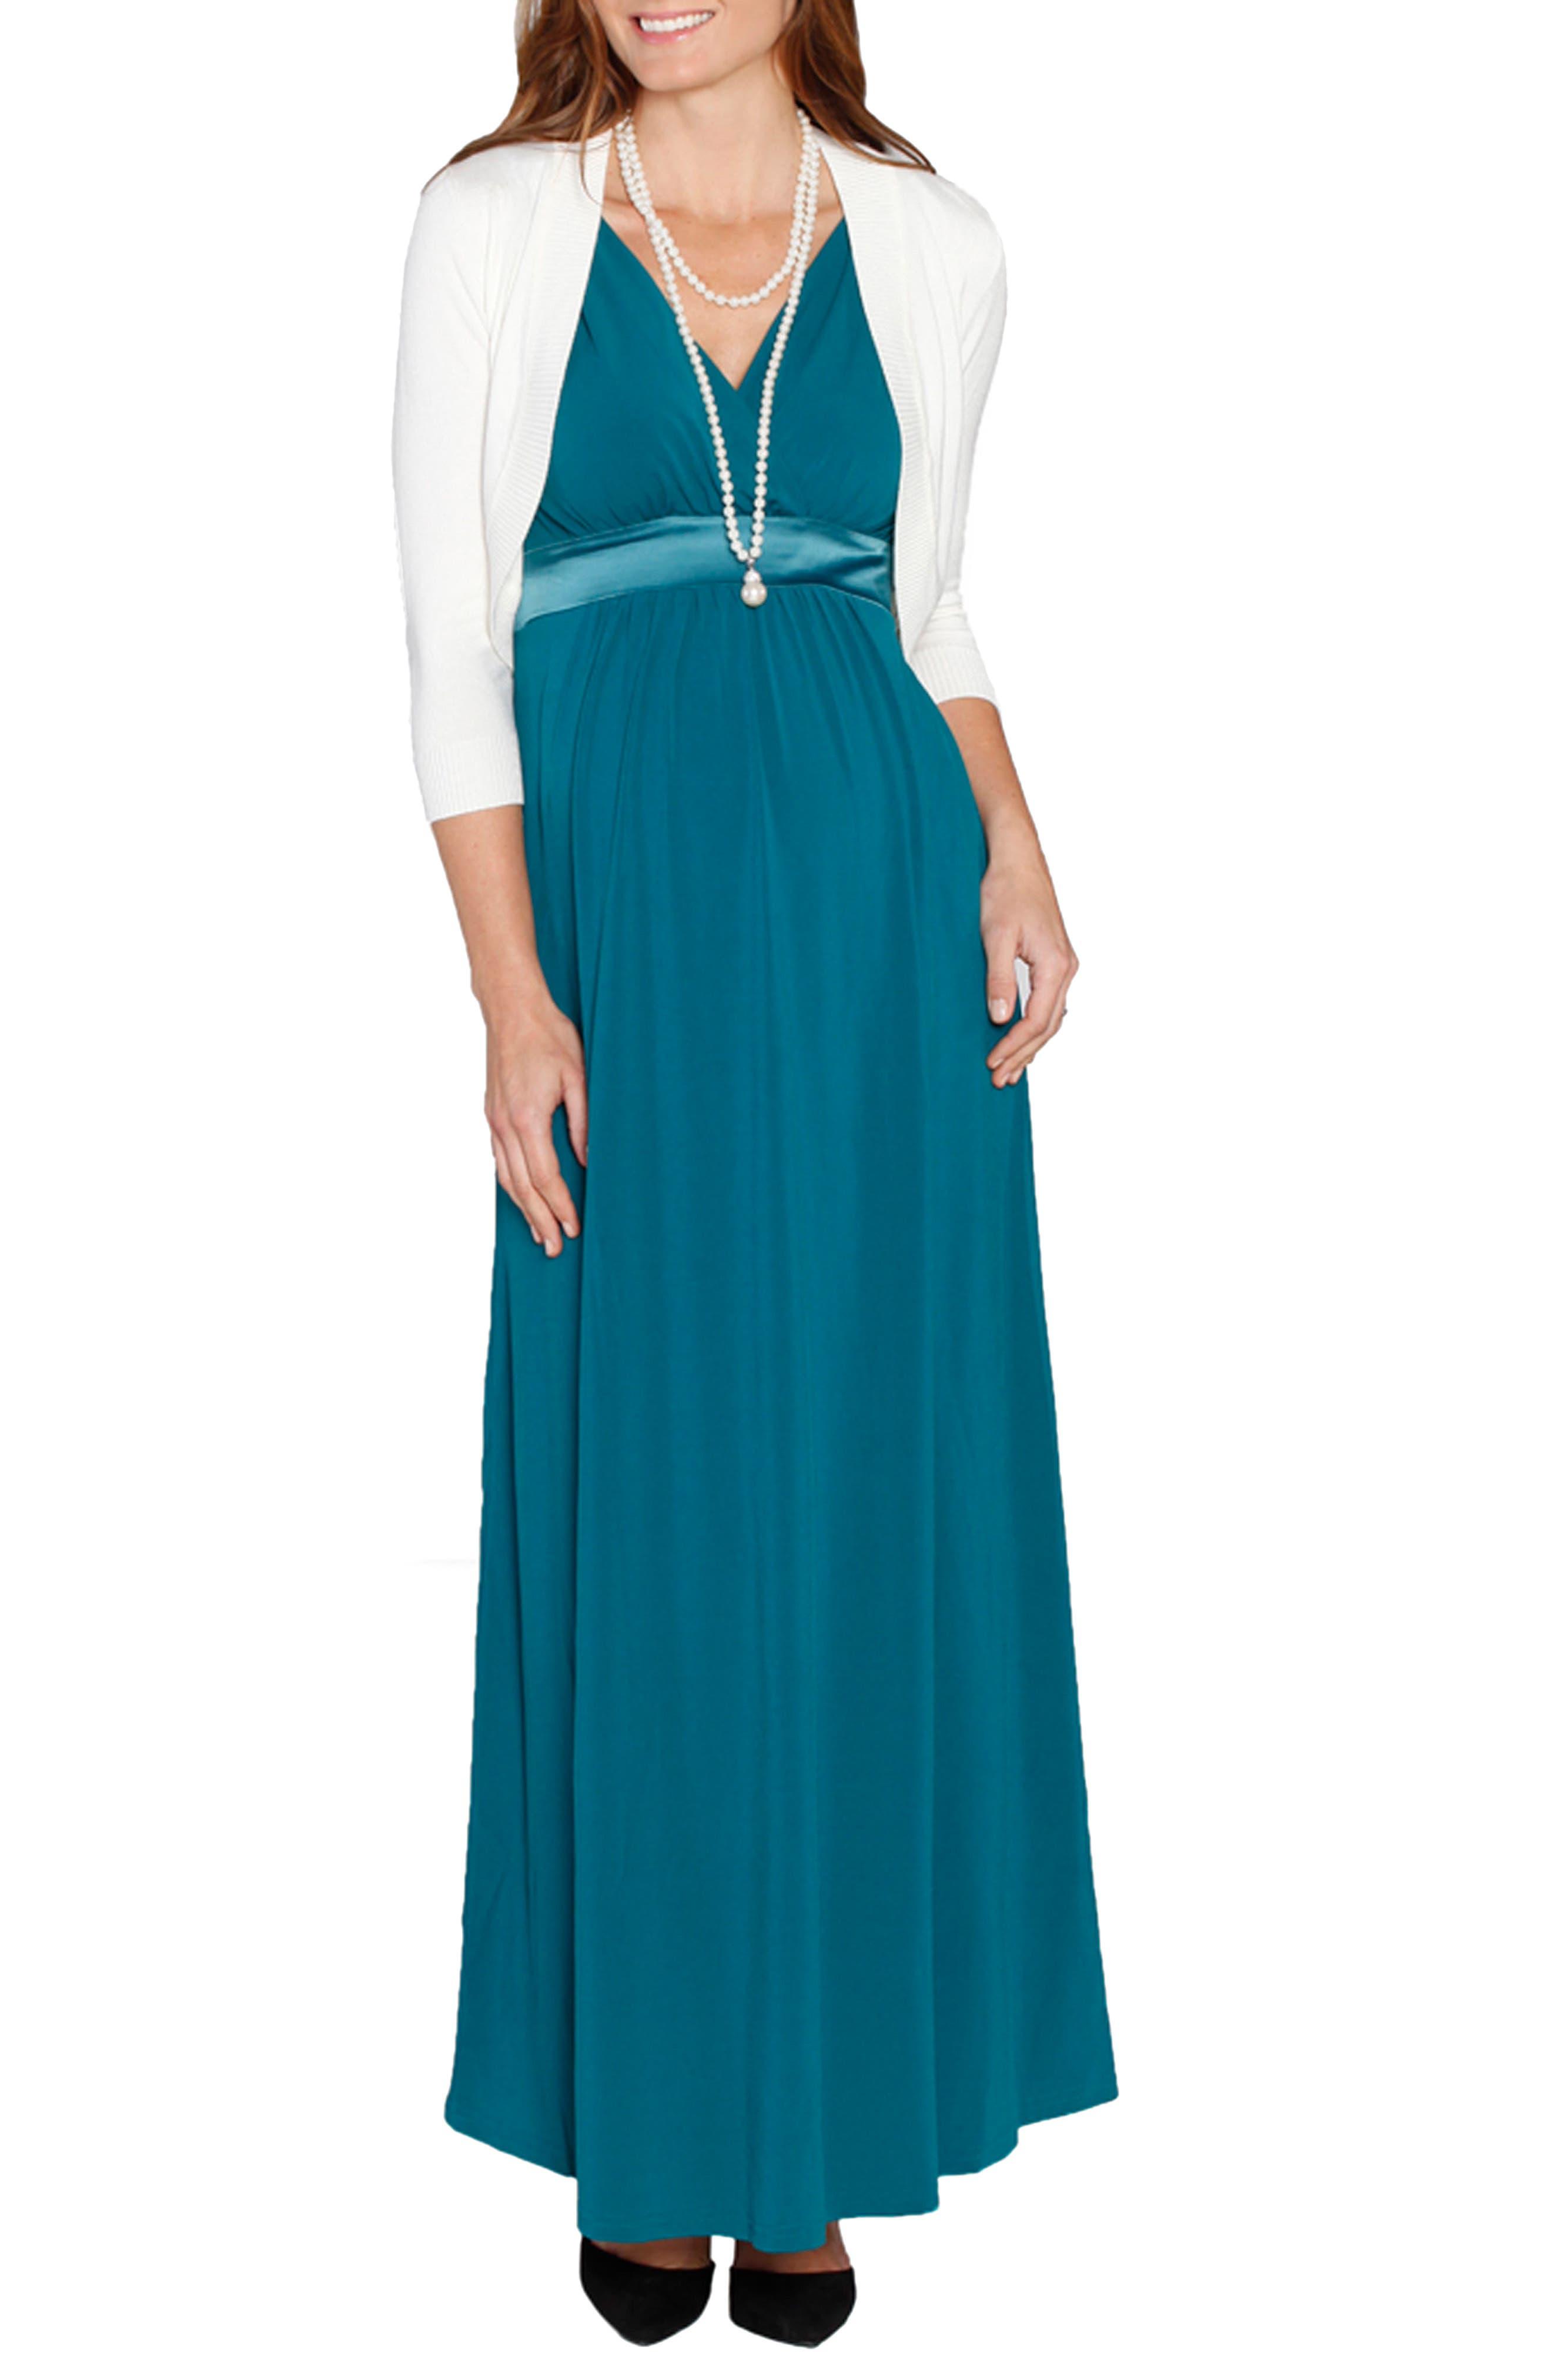 Angel Tie Waist Sleeveless Maternity/Nursing Gown & Bolero